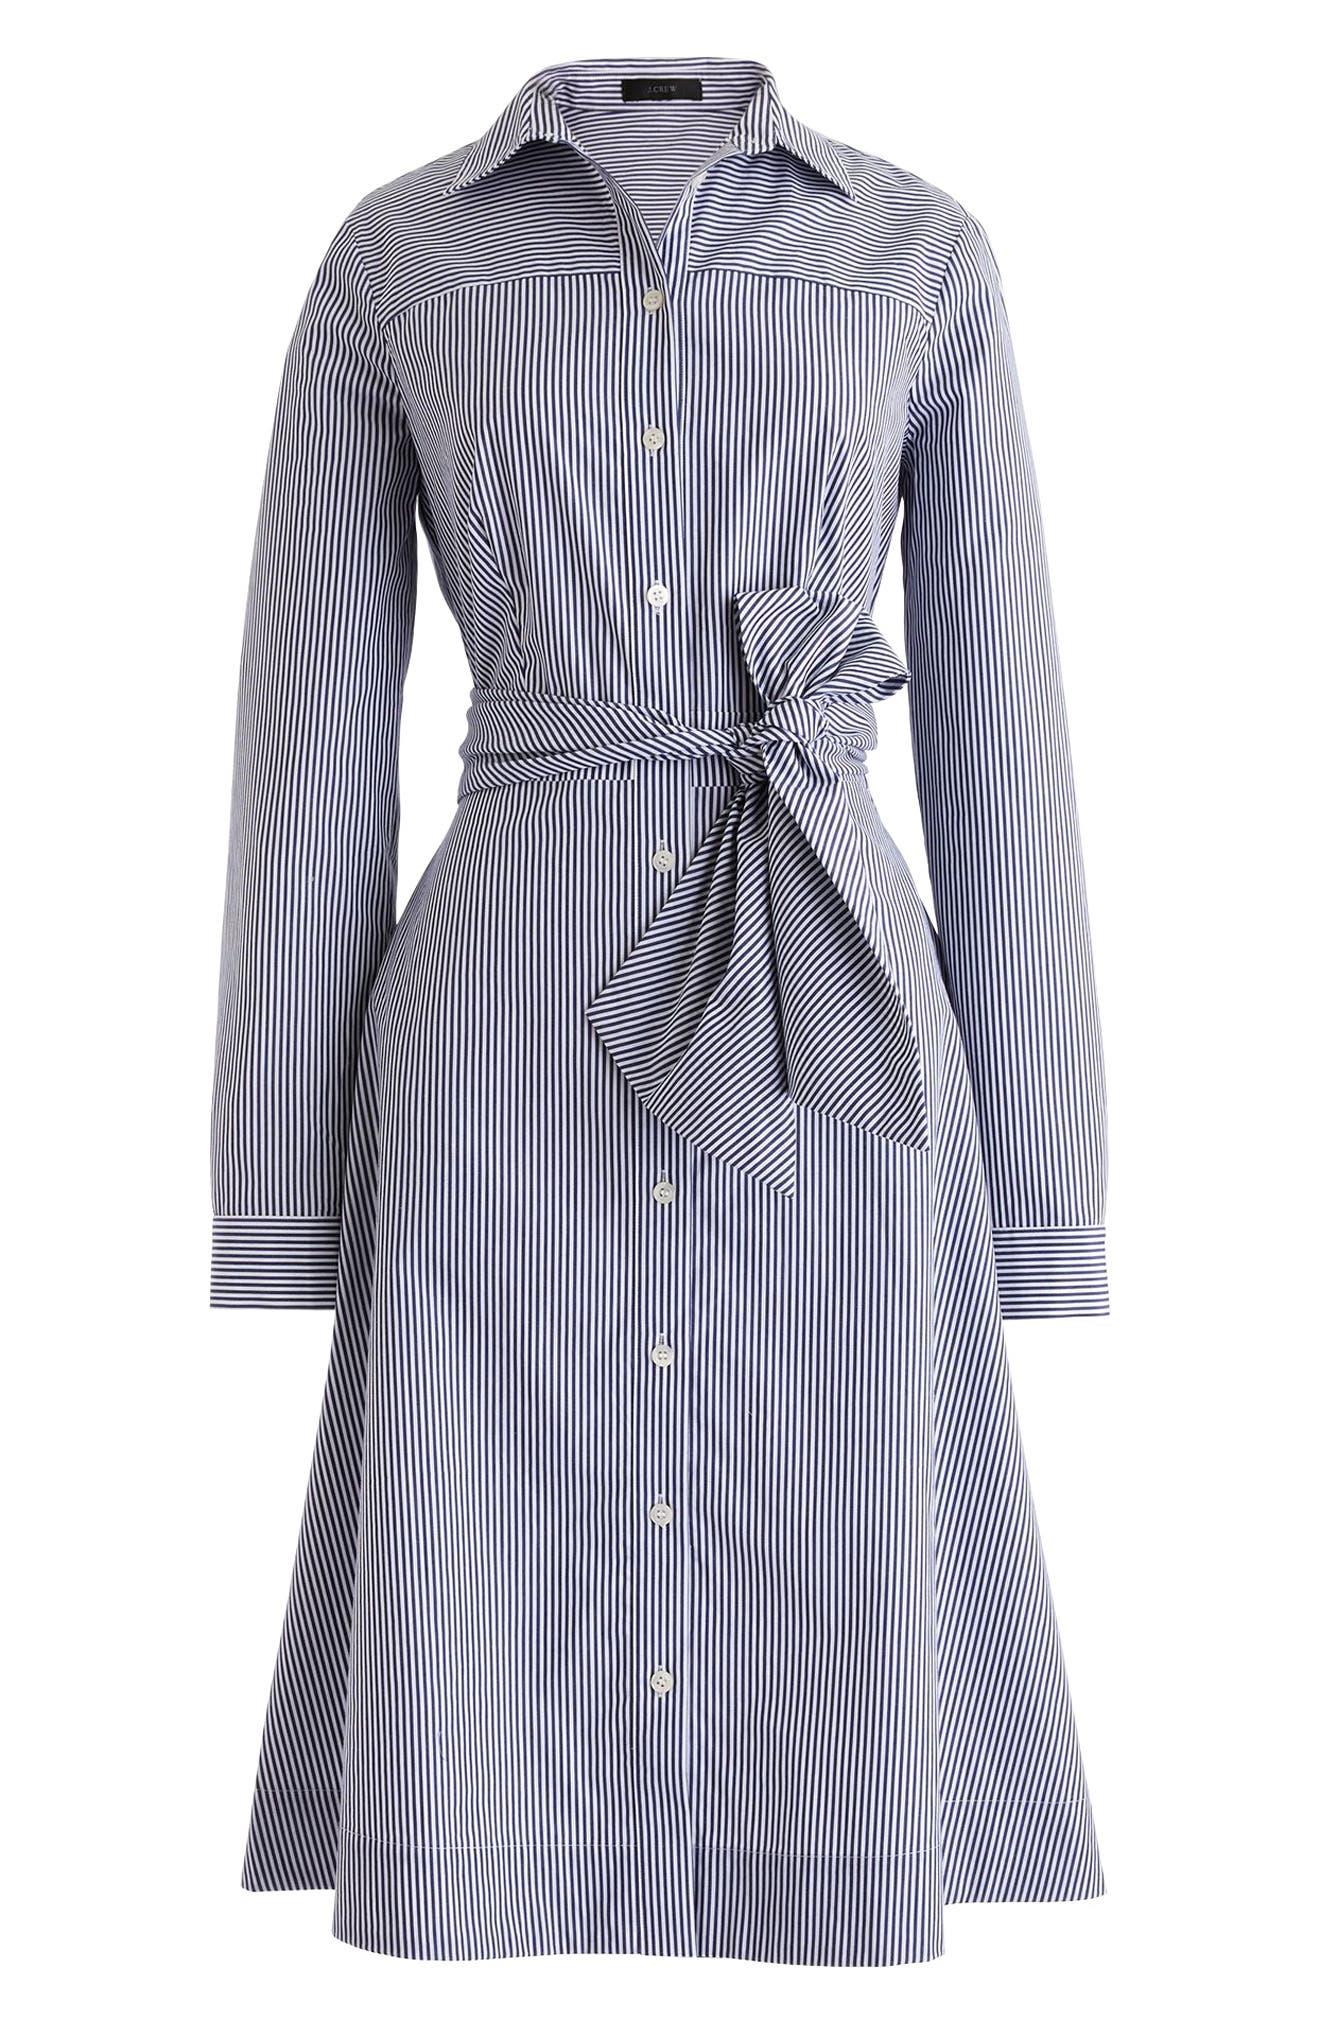 J.CREW, Stripe Tie-Waist Shirtdress, Alternate thumbnail 3, color, WHITE NAVY